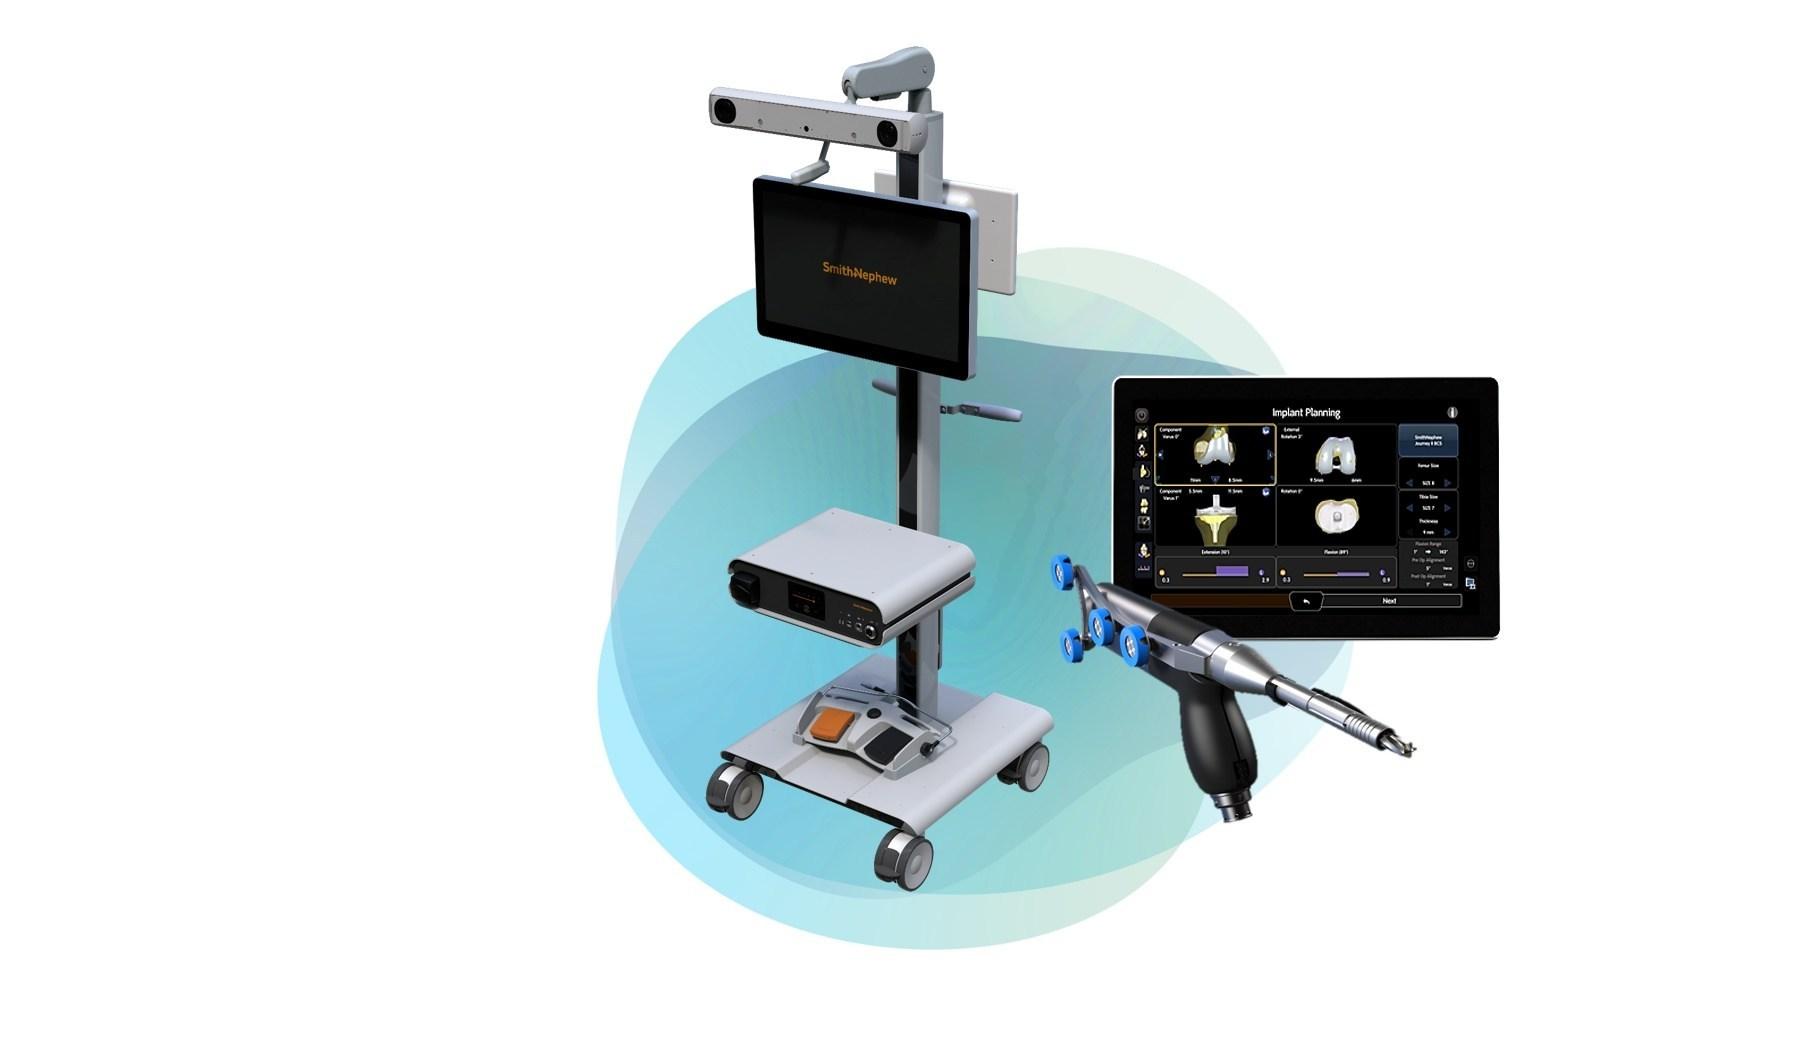 robotics surgery market smith nephew